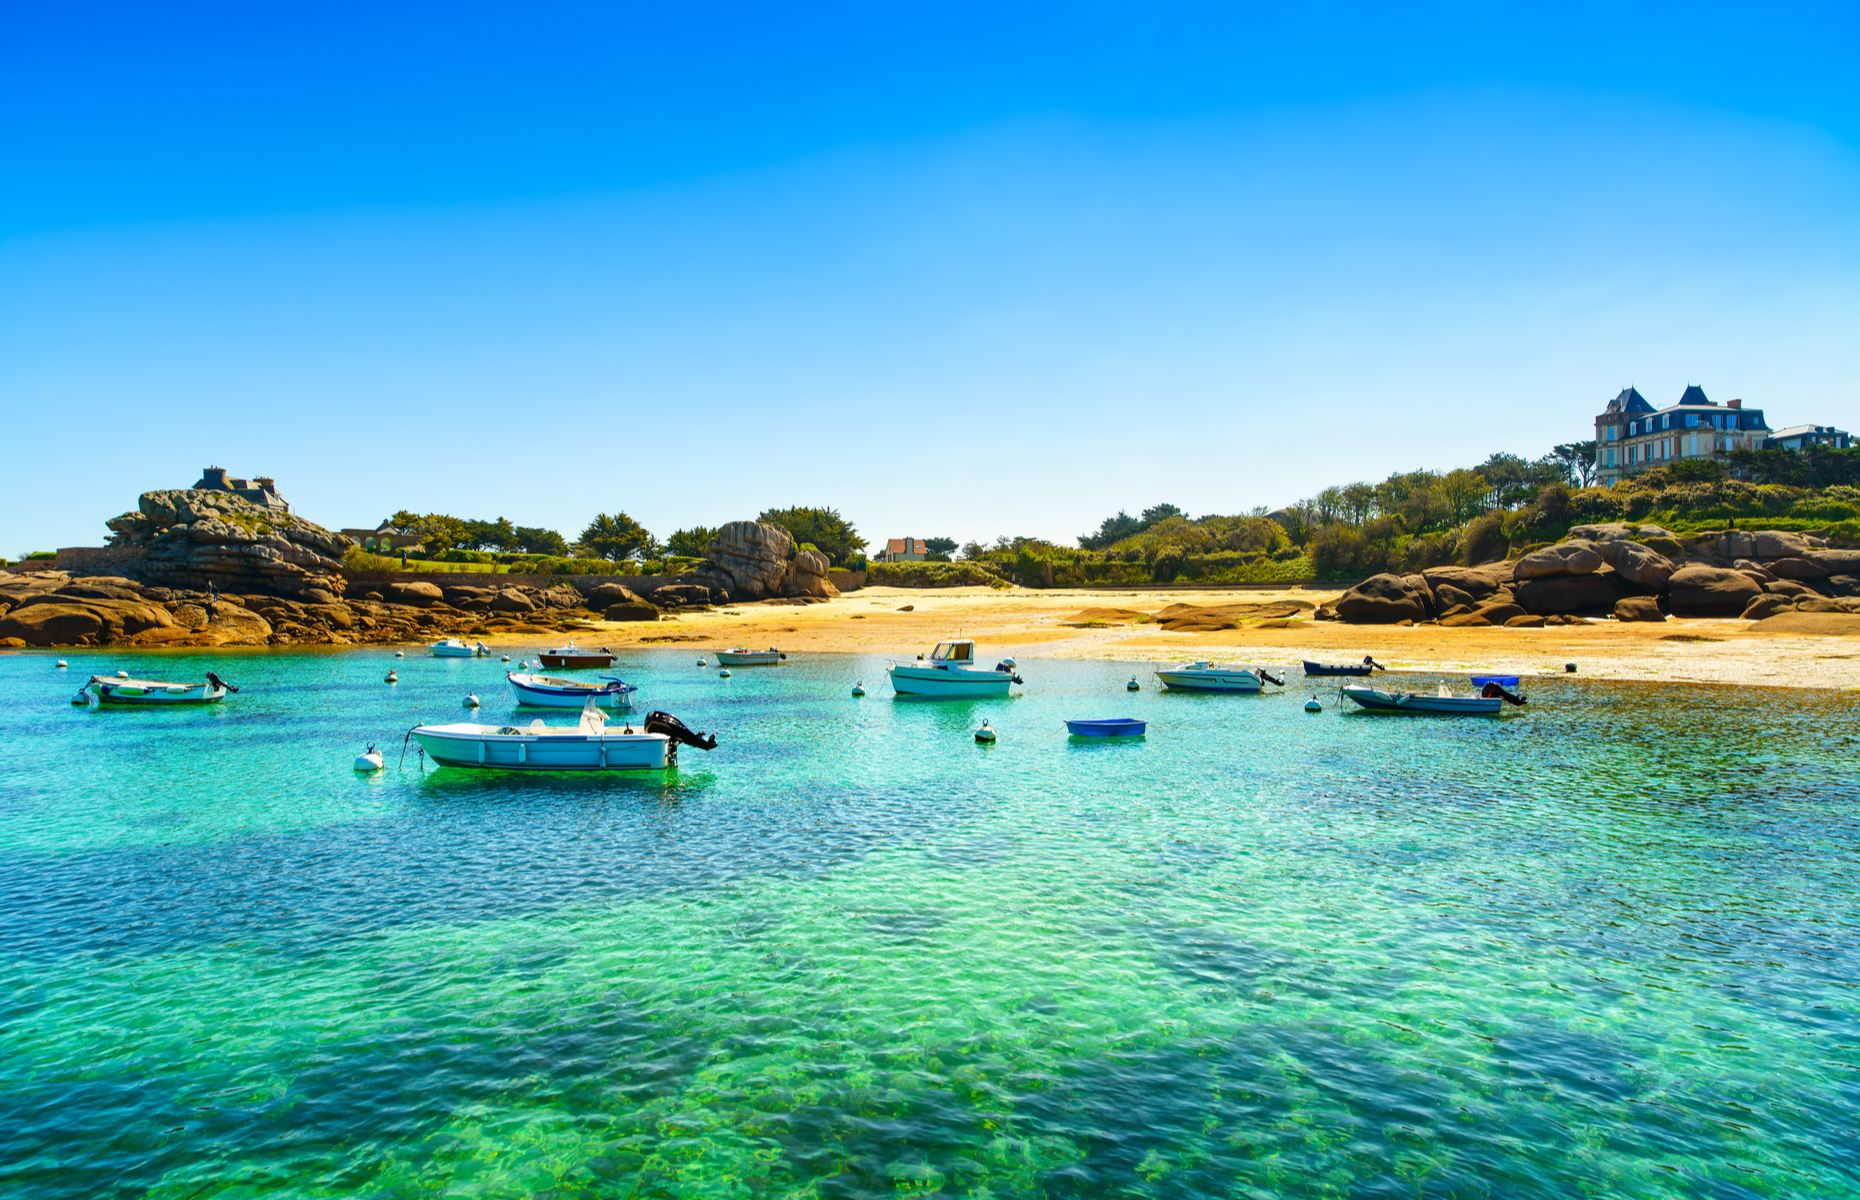 Fishing village in Brittany (Image: StevanZZ/Shutterstock)